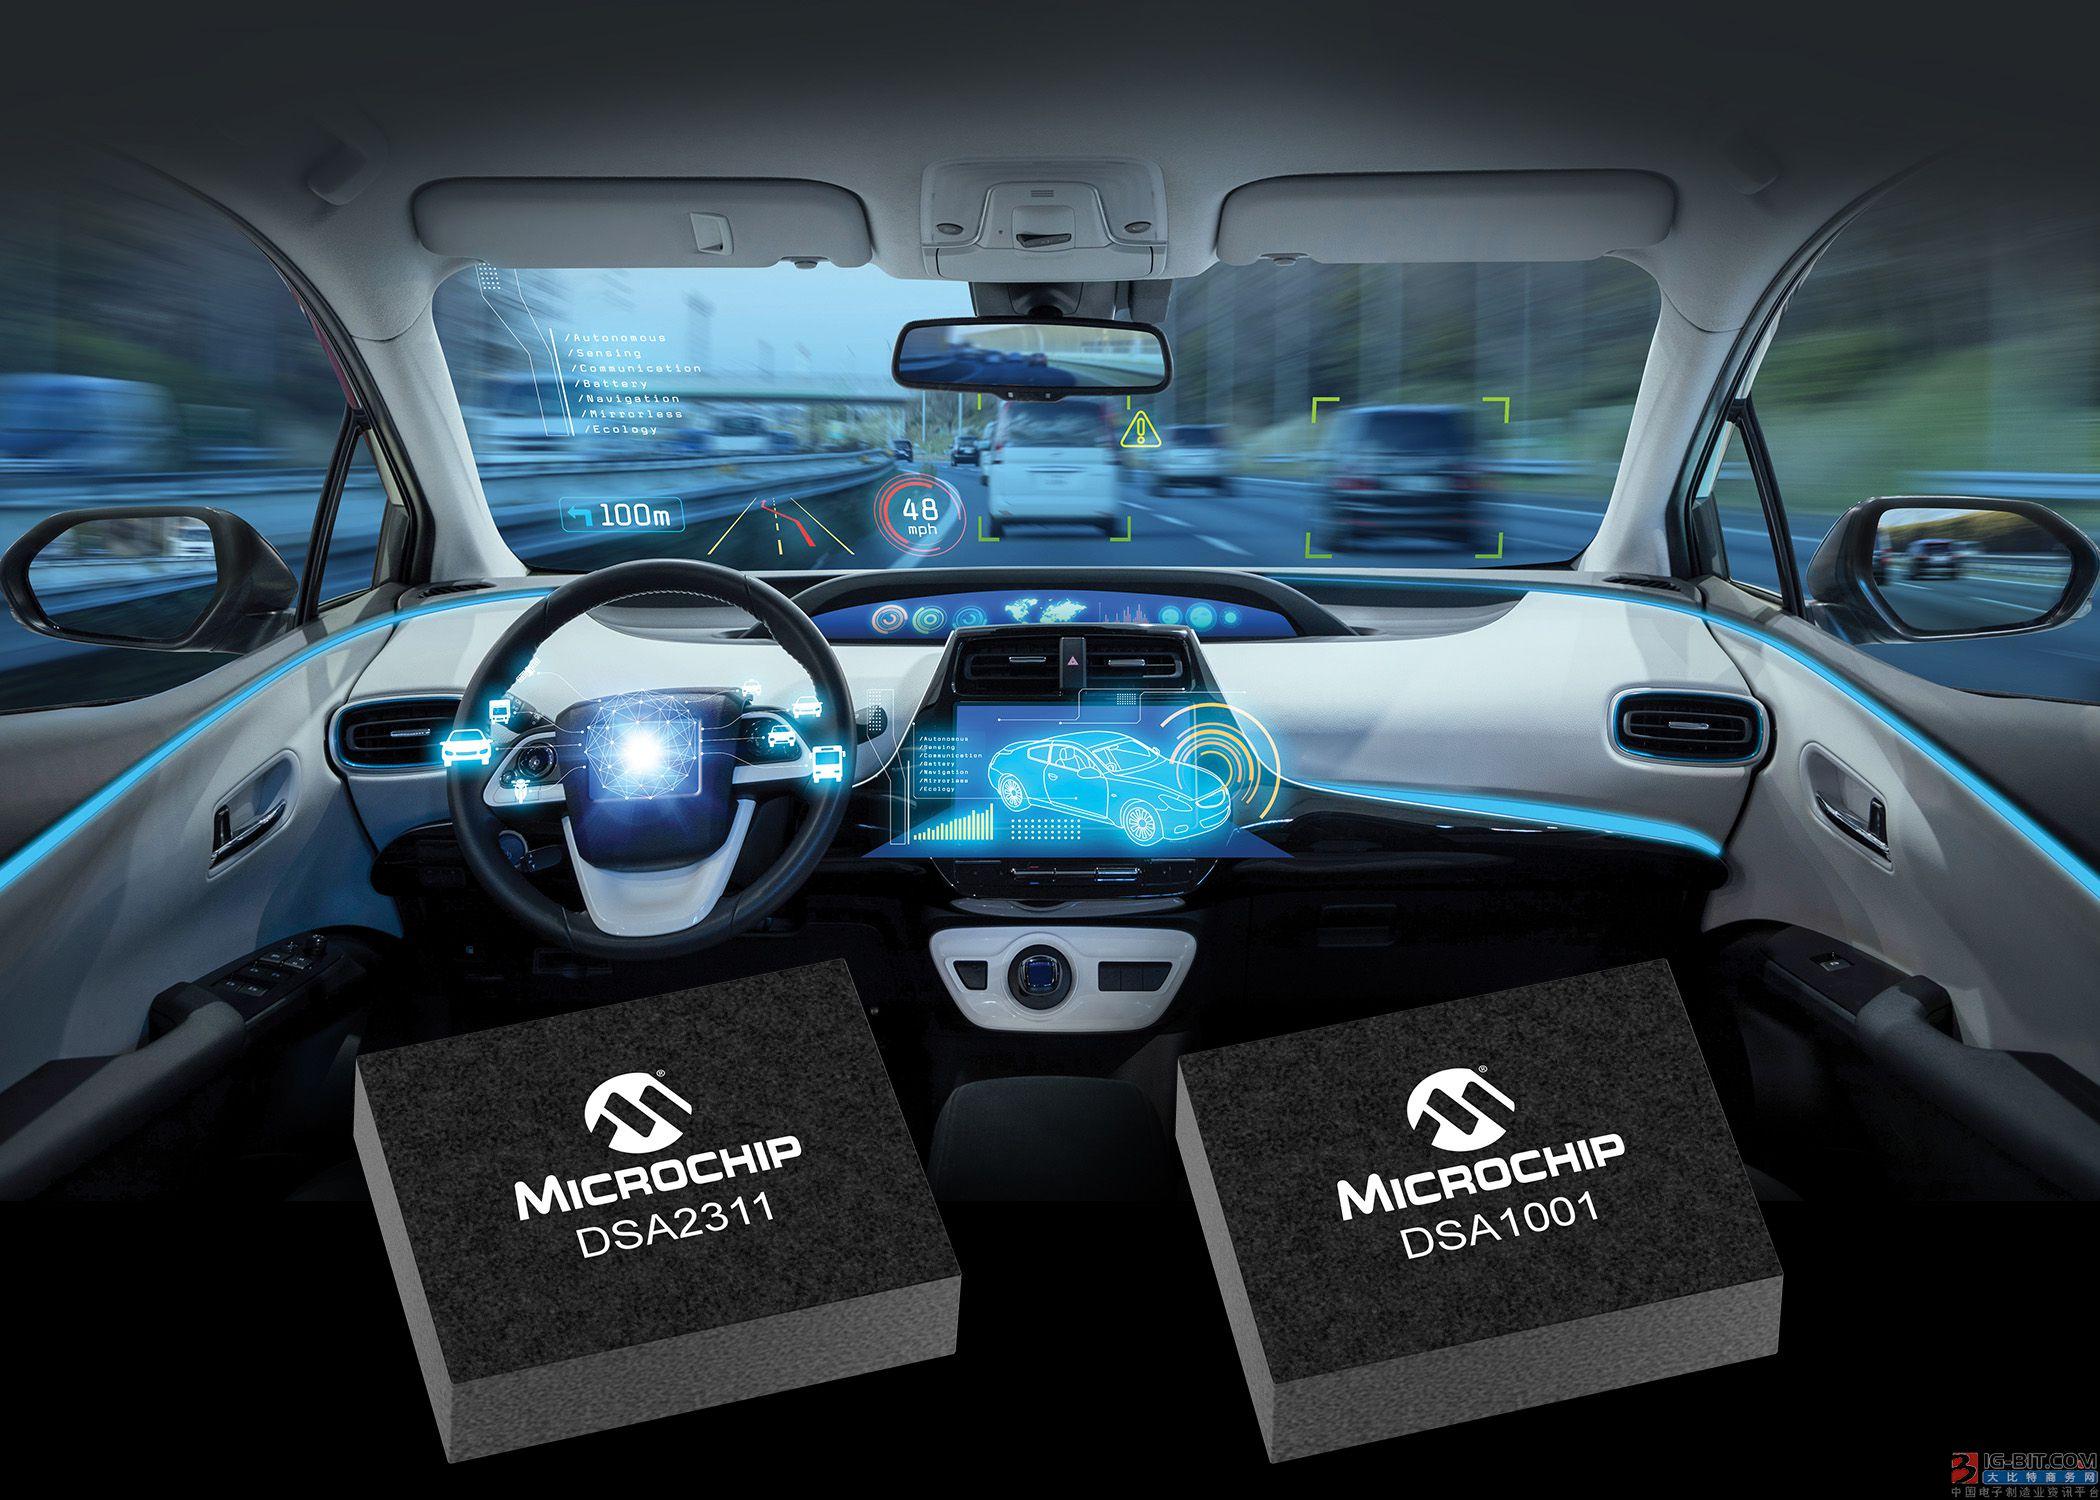 Microchip新型汽车级MEMS振荡器问世 ——有效改善恶劣环境下的可靠性及性能